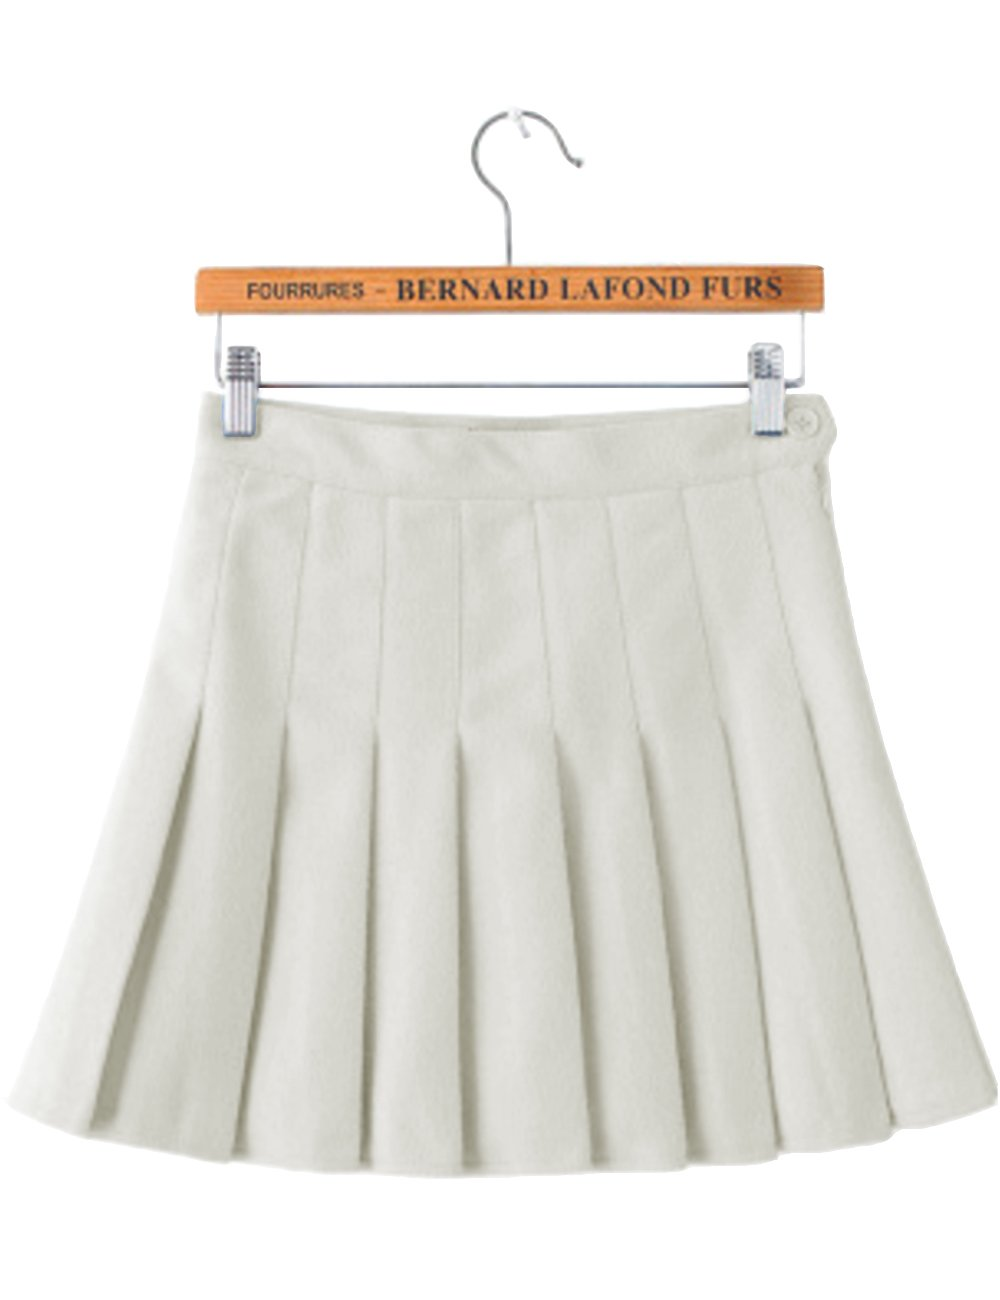 Free Girls Skirt Pattern Patterns Gallery